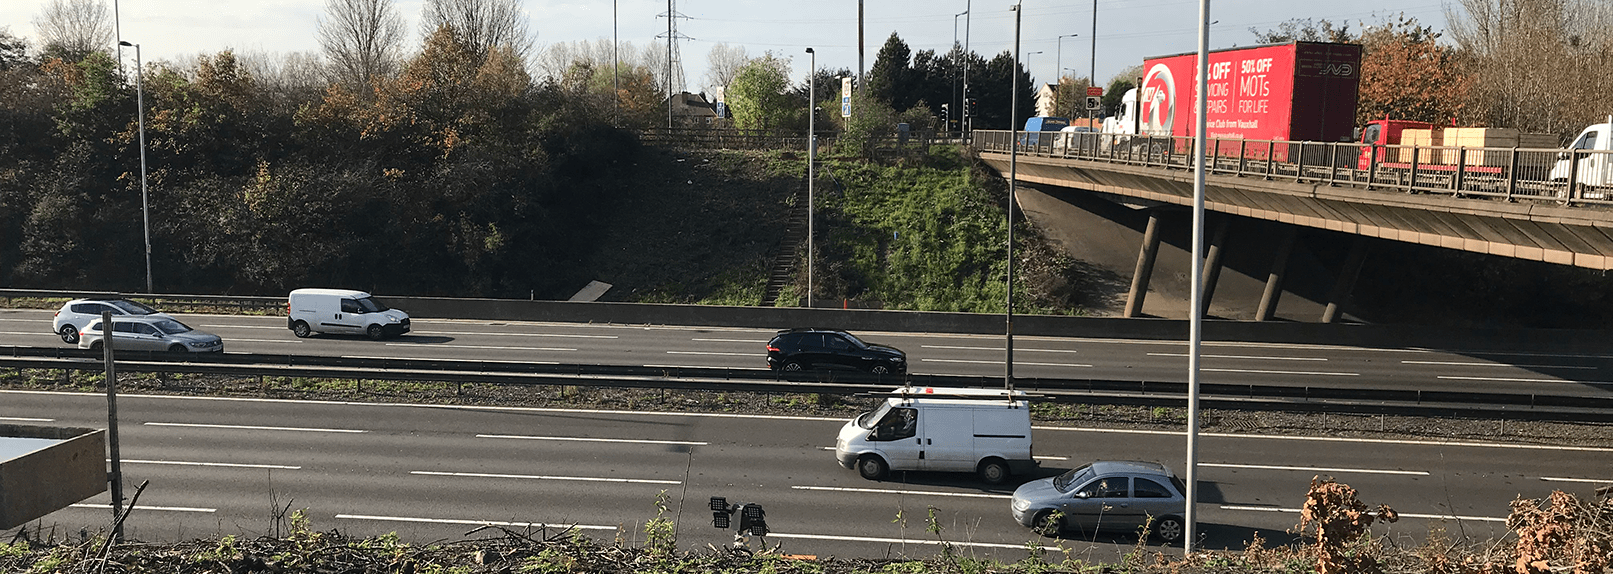 M6 Junction 10